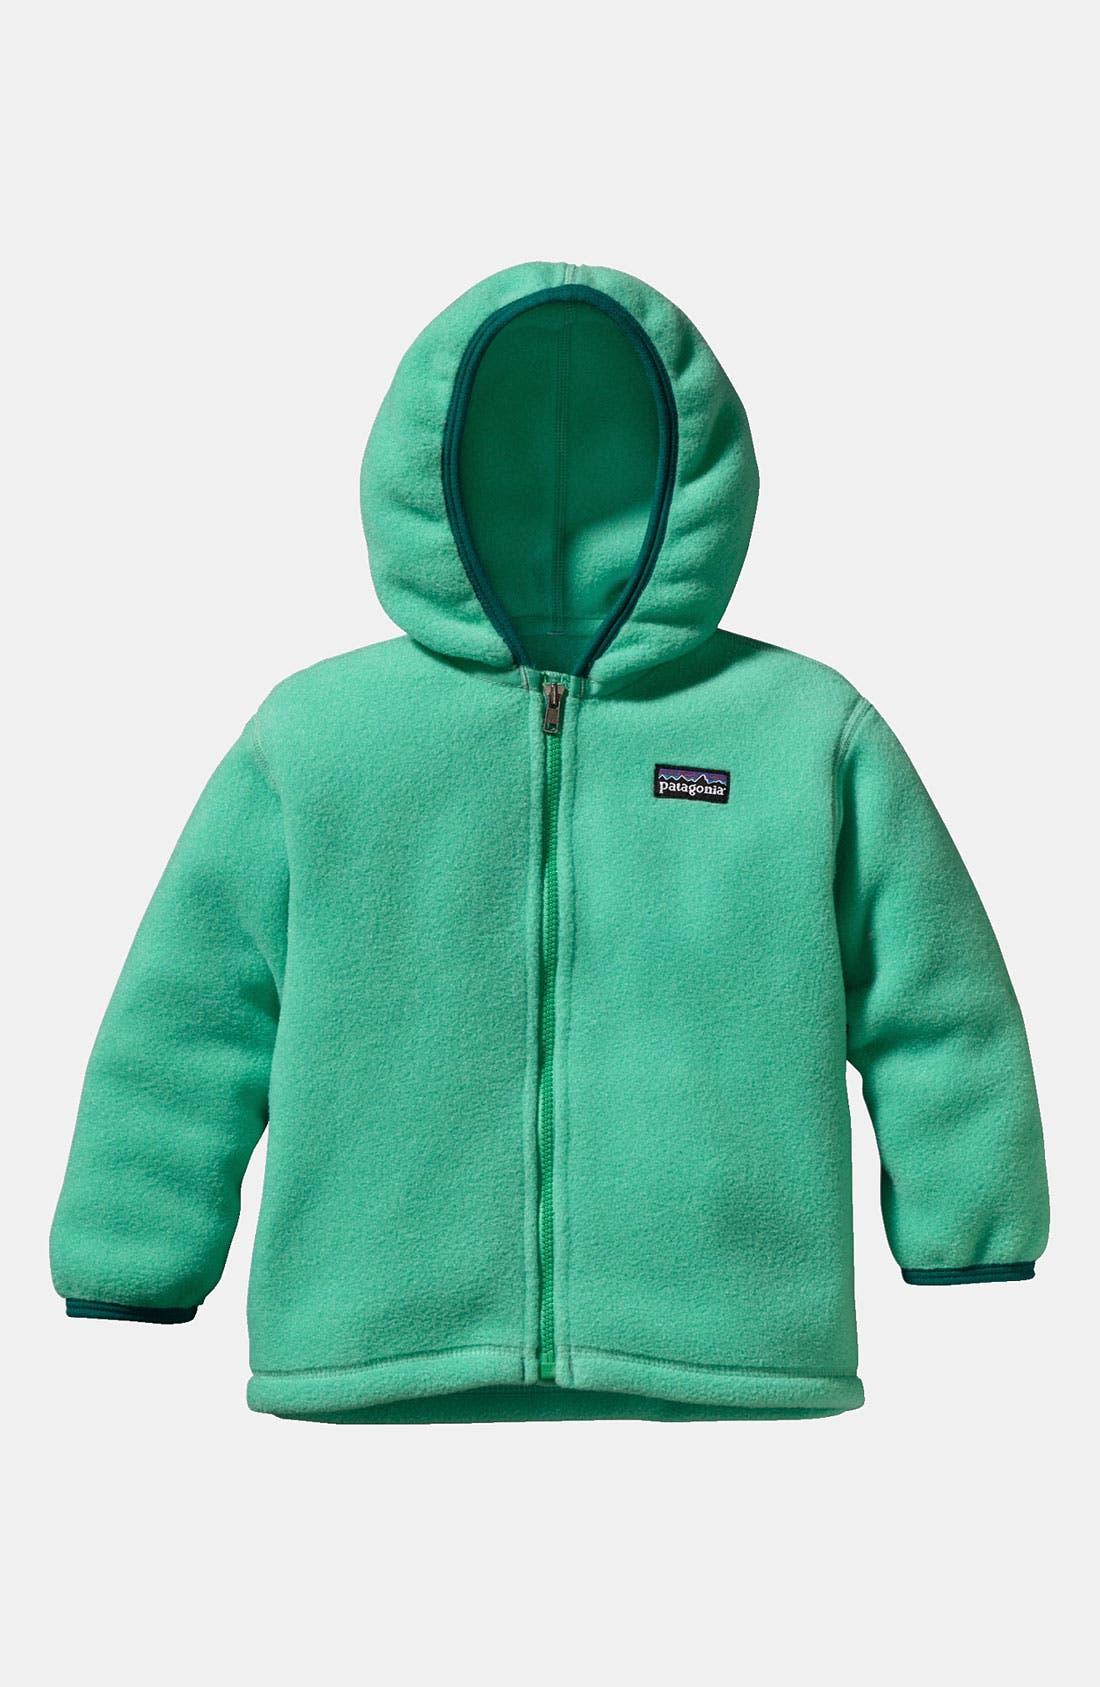 Alternate Image 1 Selected - Patagonia Hooded Fleece Cardigan (Toddler)